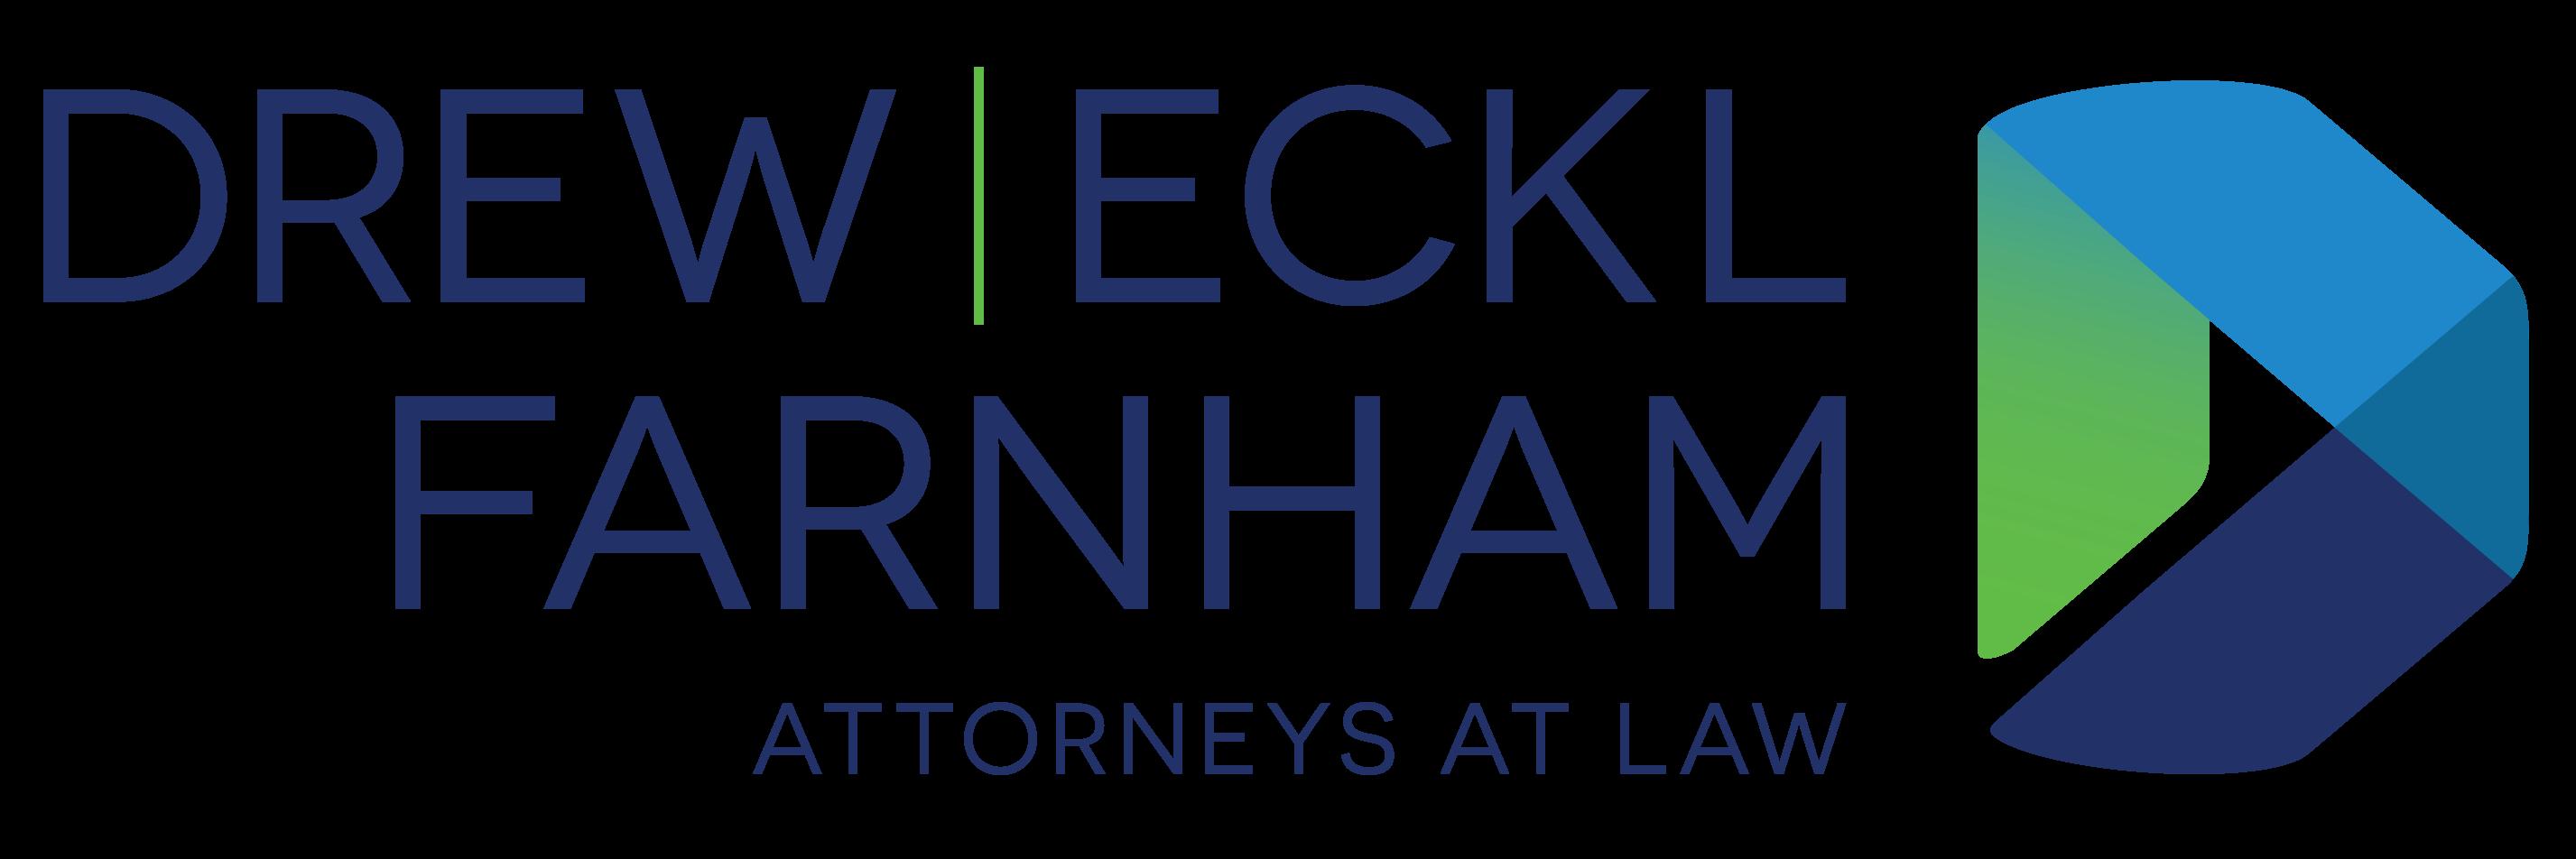 Drew Eckl & Farnham Company Logo